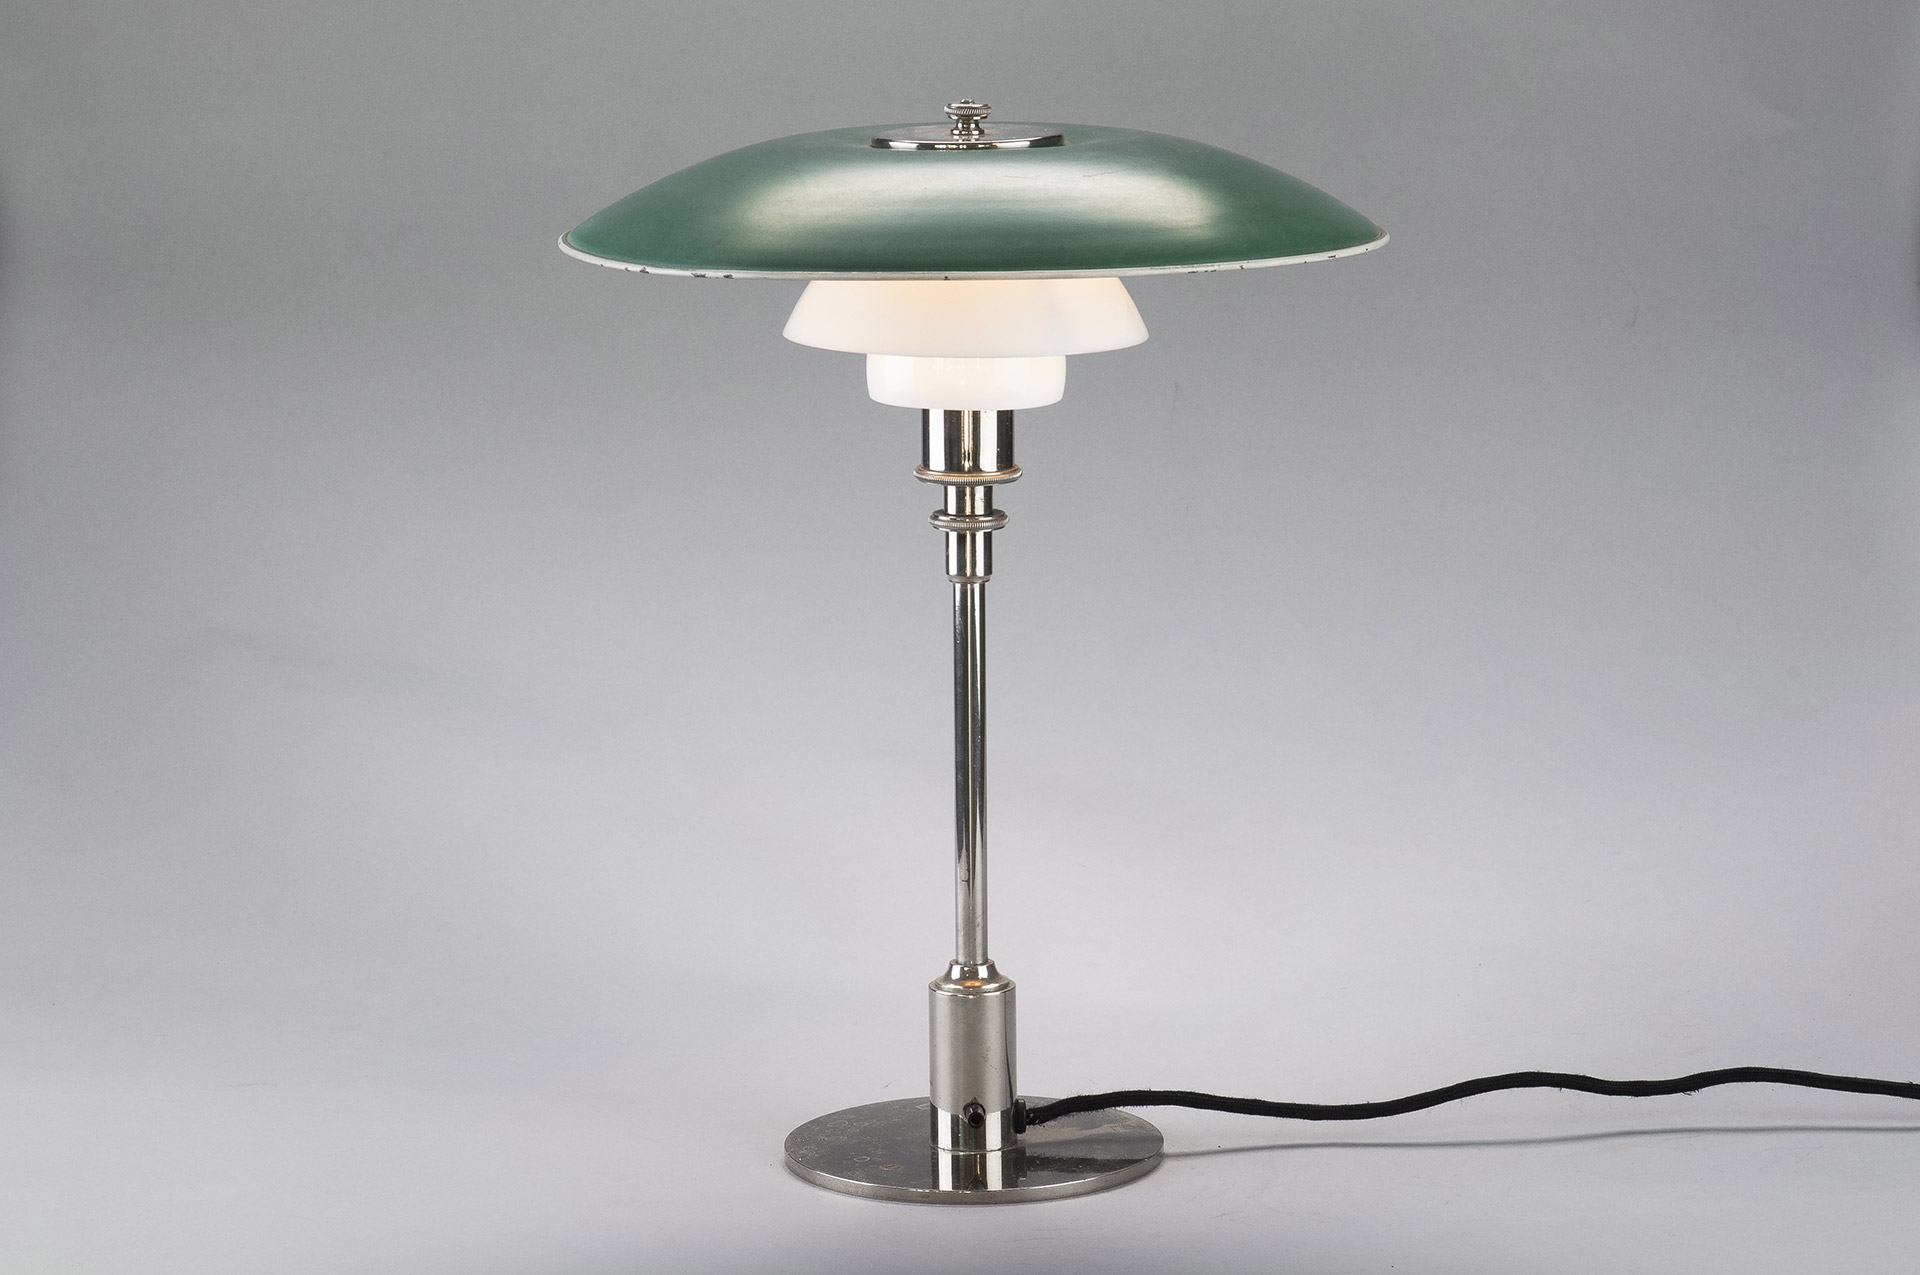 jacksons ph table lamp poul henningsen. Black Bedroom Furniture Sets. Home Design Ideas